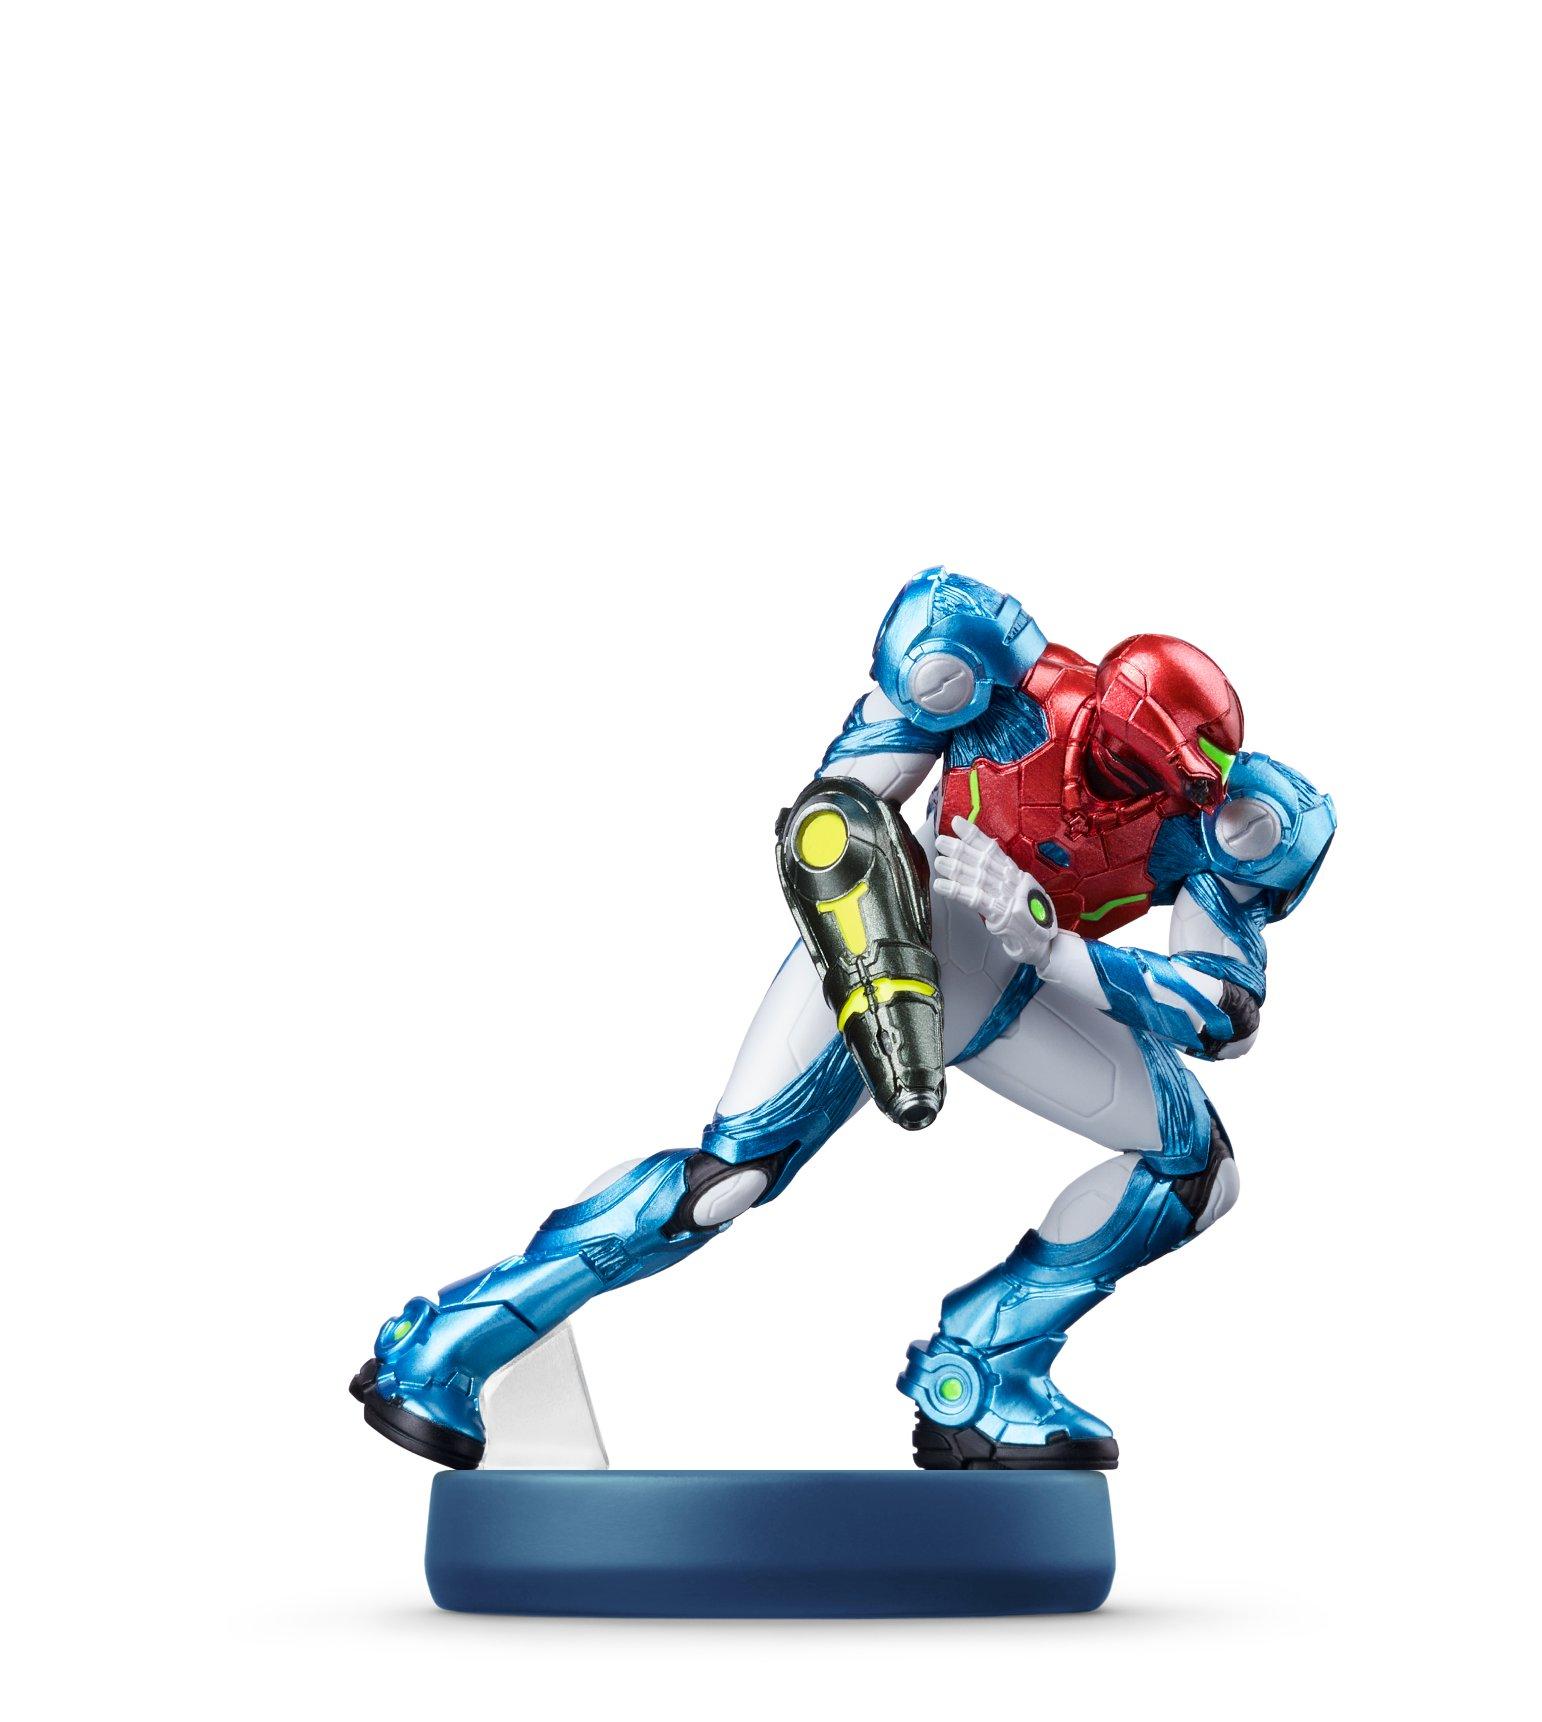 Amiibo Samus (Metroid Dread) - Nintendo Switch - LISTA DE ESPERA